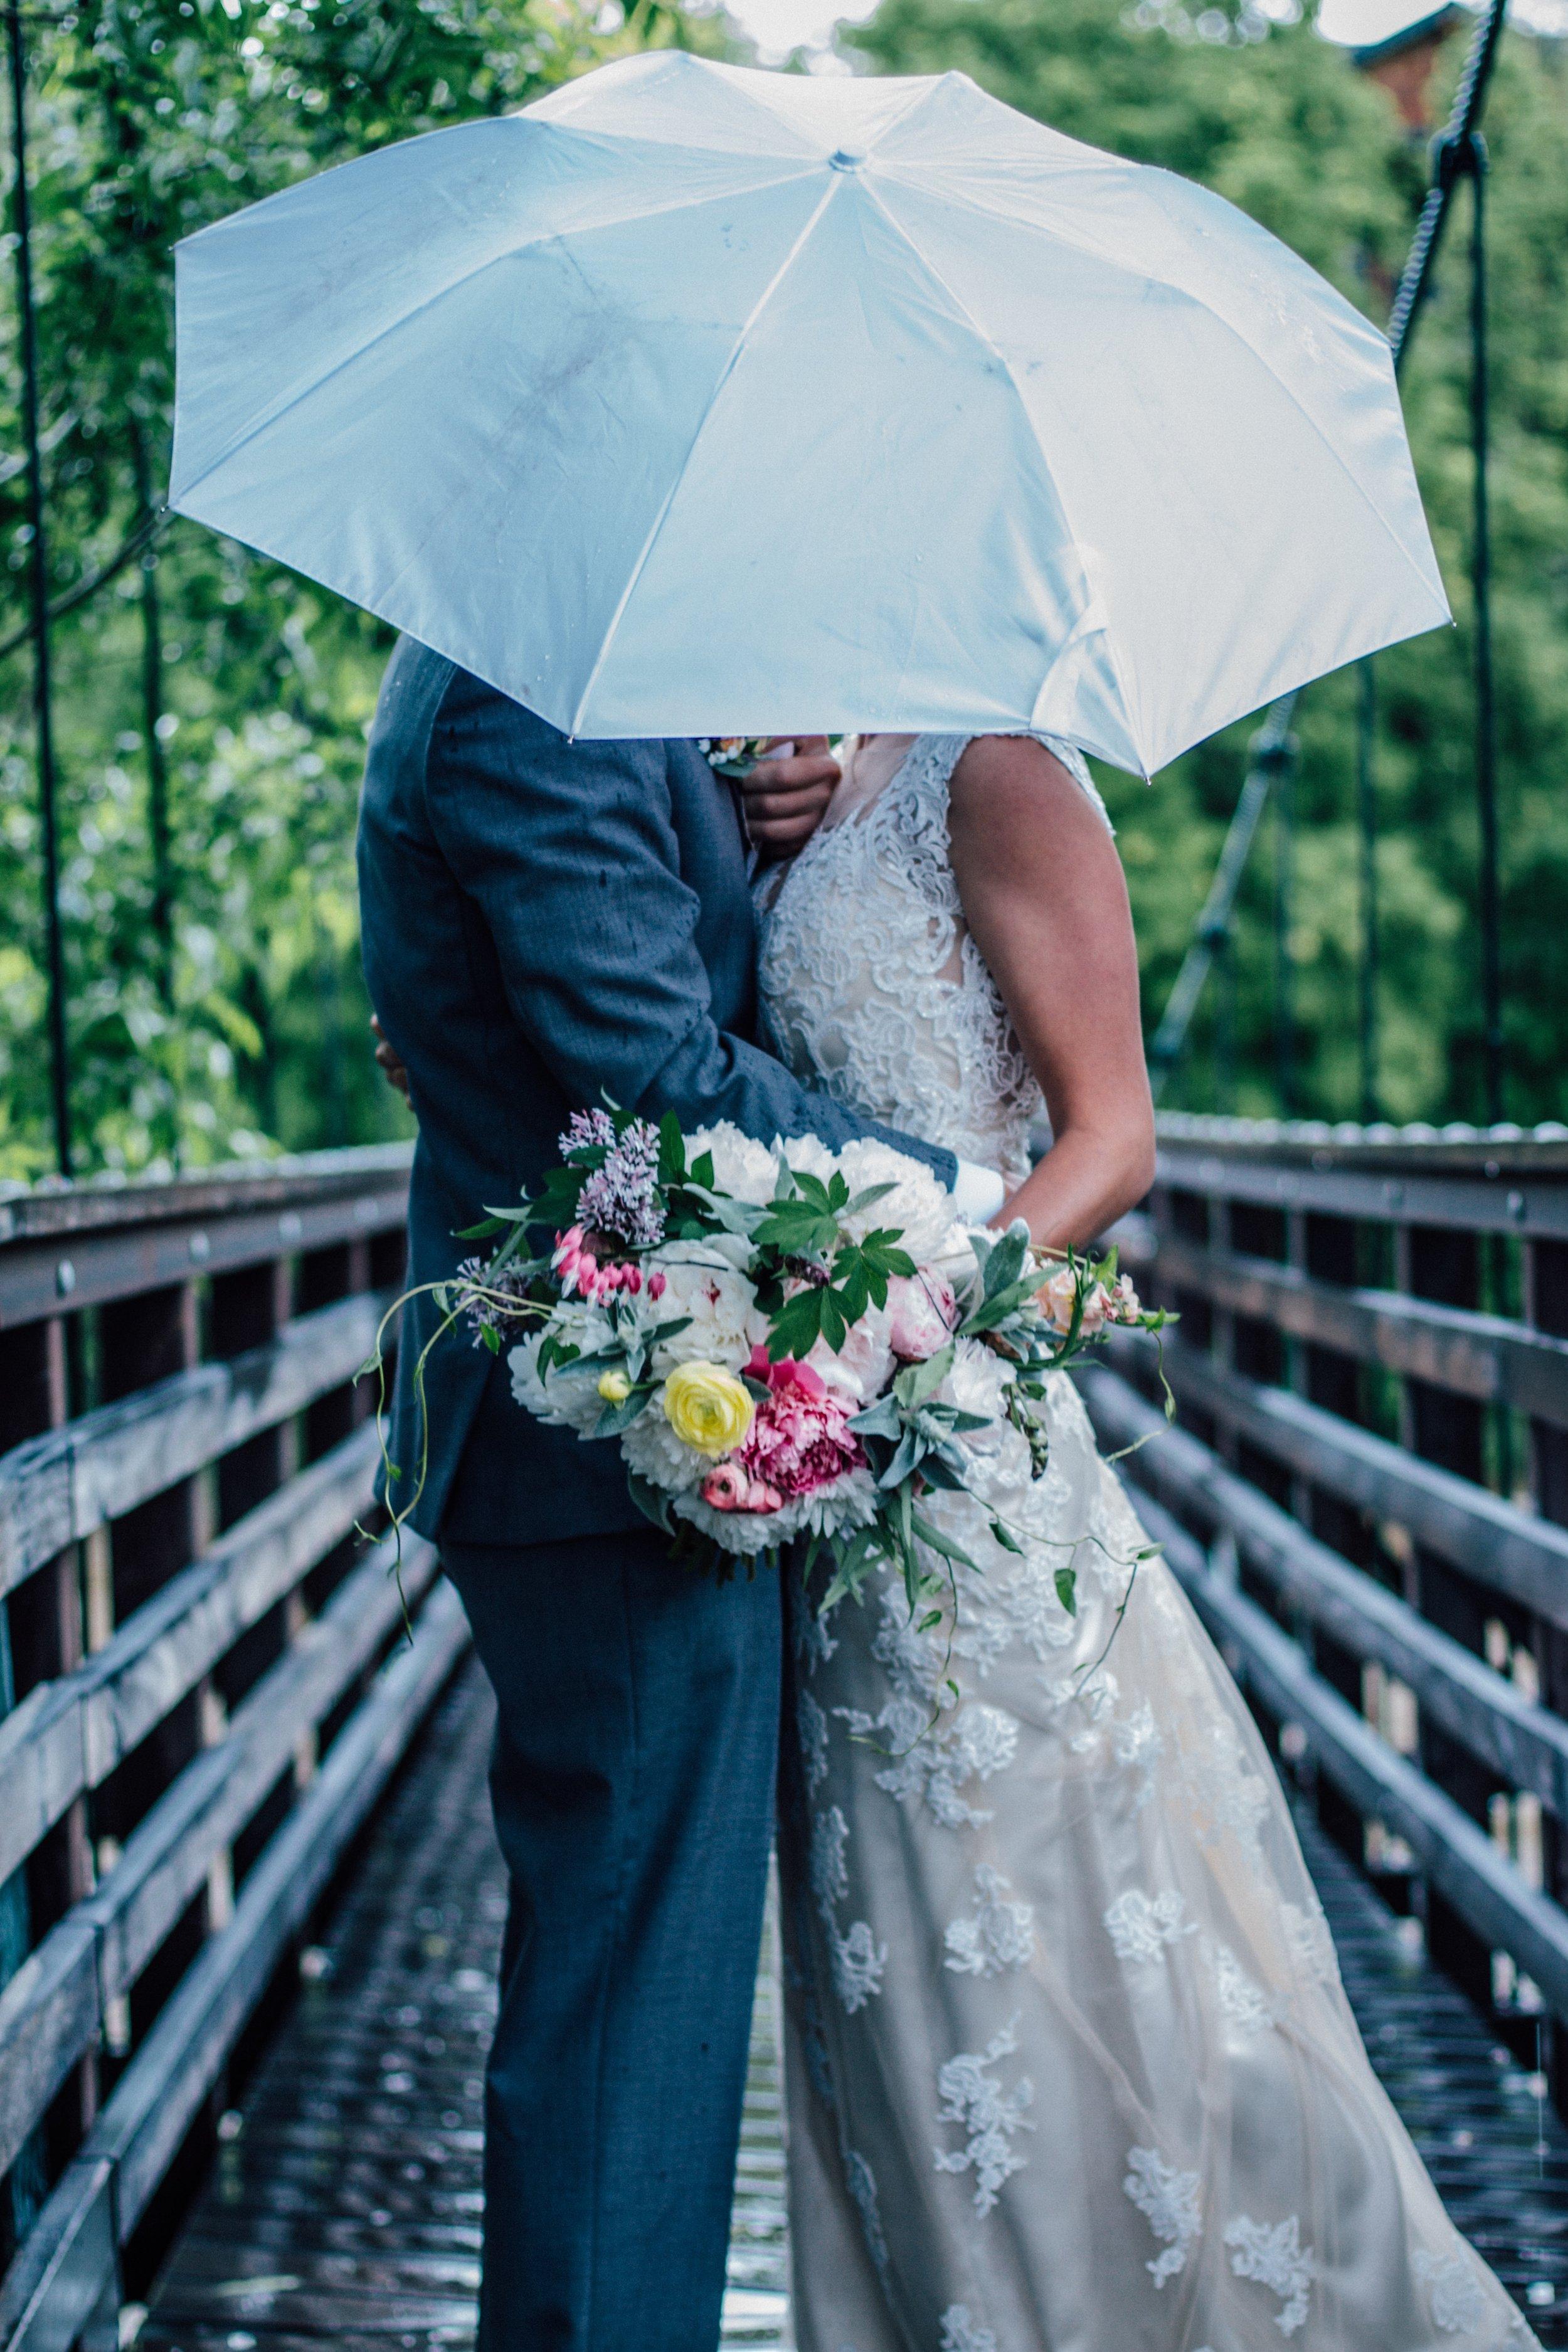 Wedding bouqet with peonies, couple under umbrella